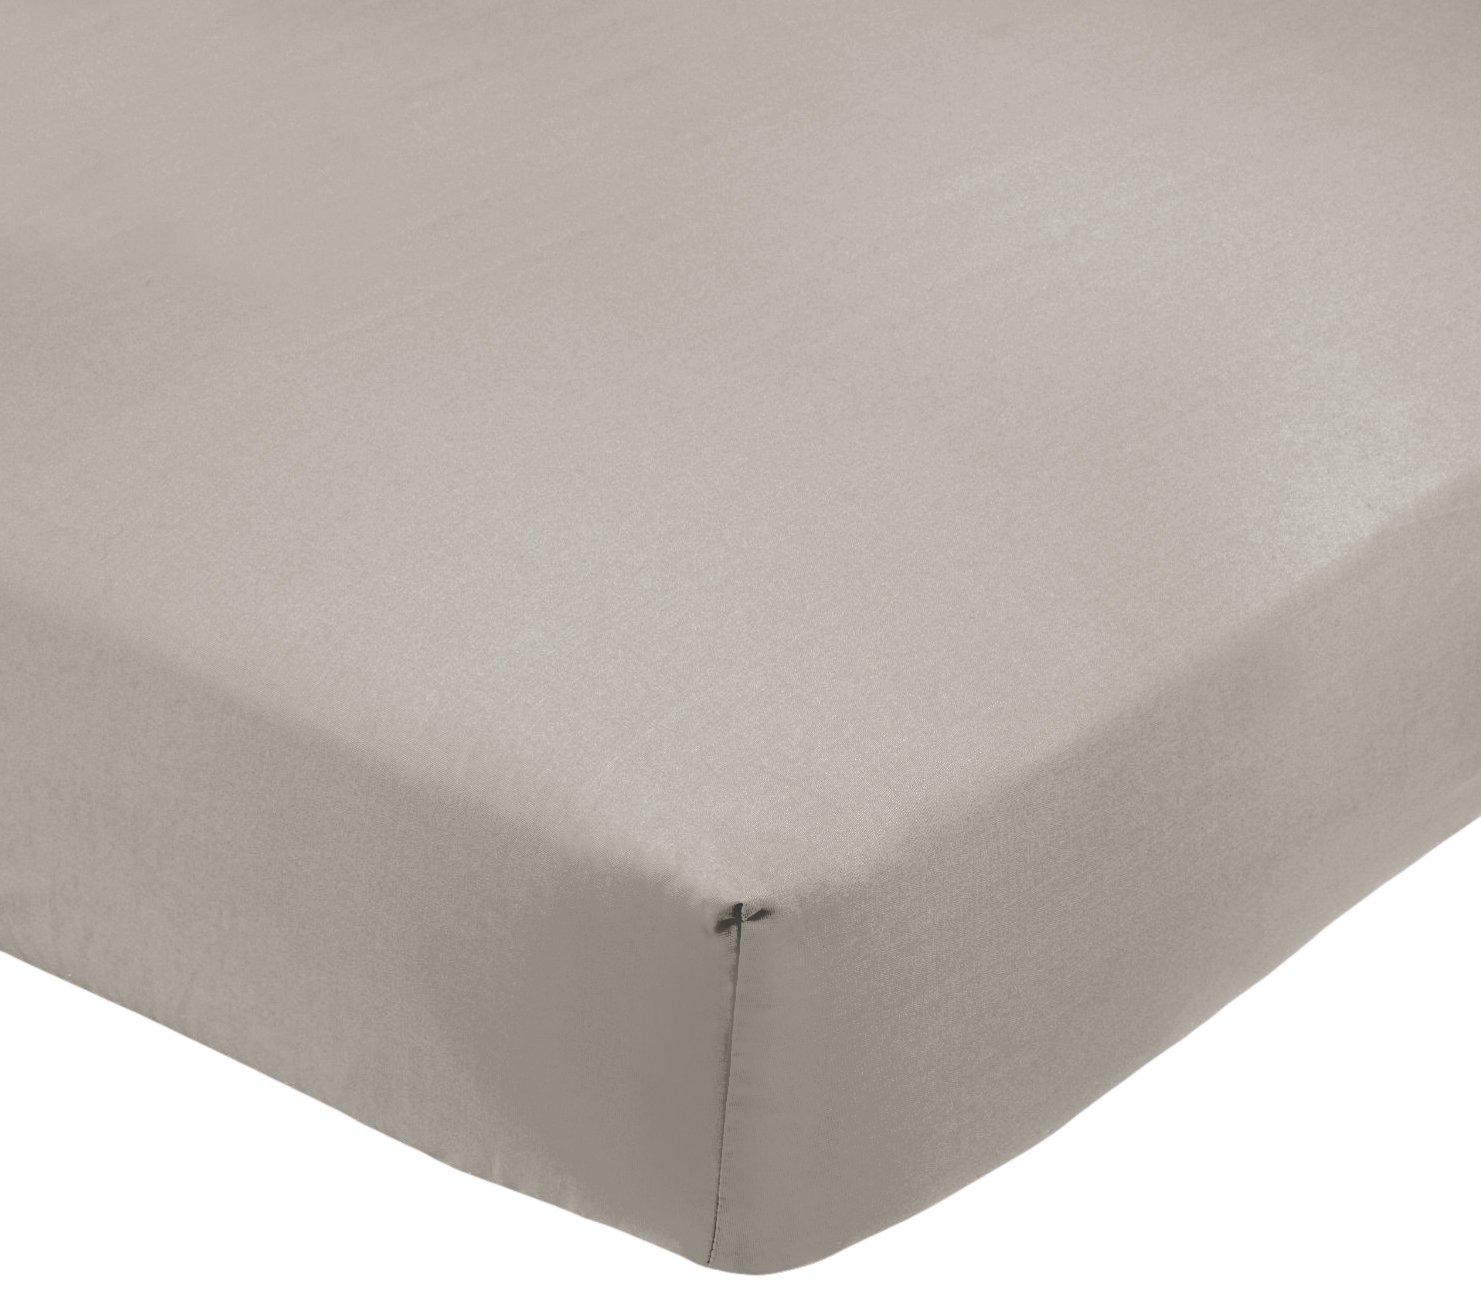 AmazonBasics – Lenzuolo matrimoniale con angoli, Policotone 200 fili, grigio – 160 x 200 x 30 cm Prezzi offerte